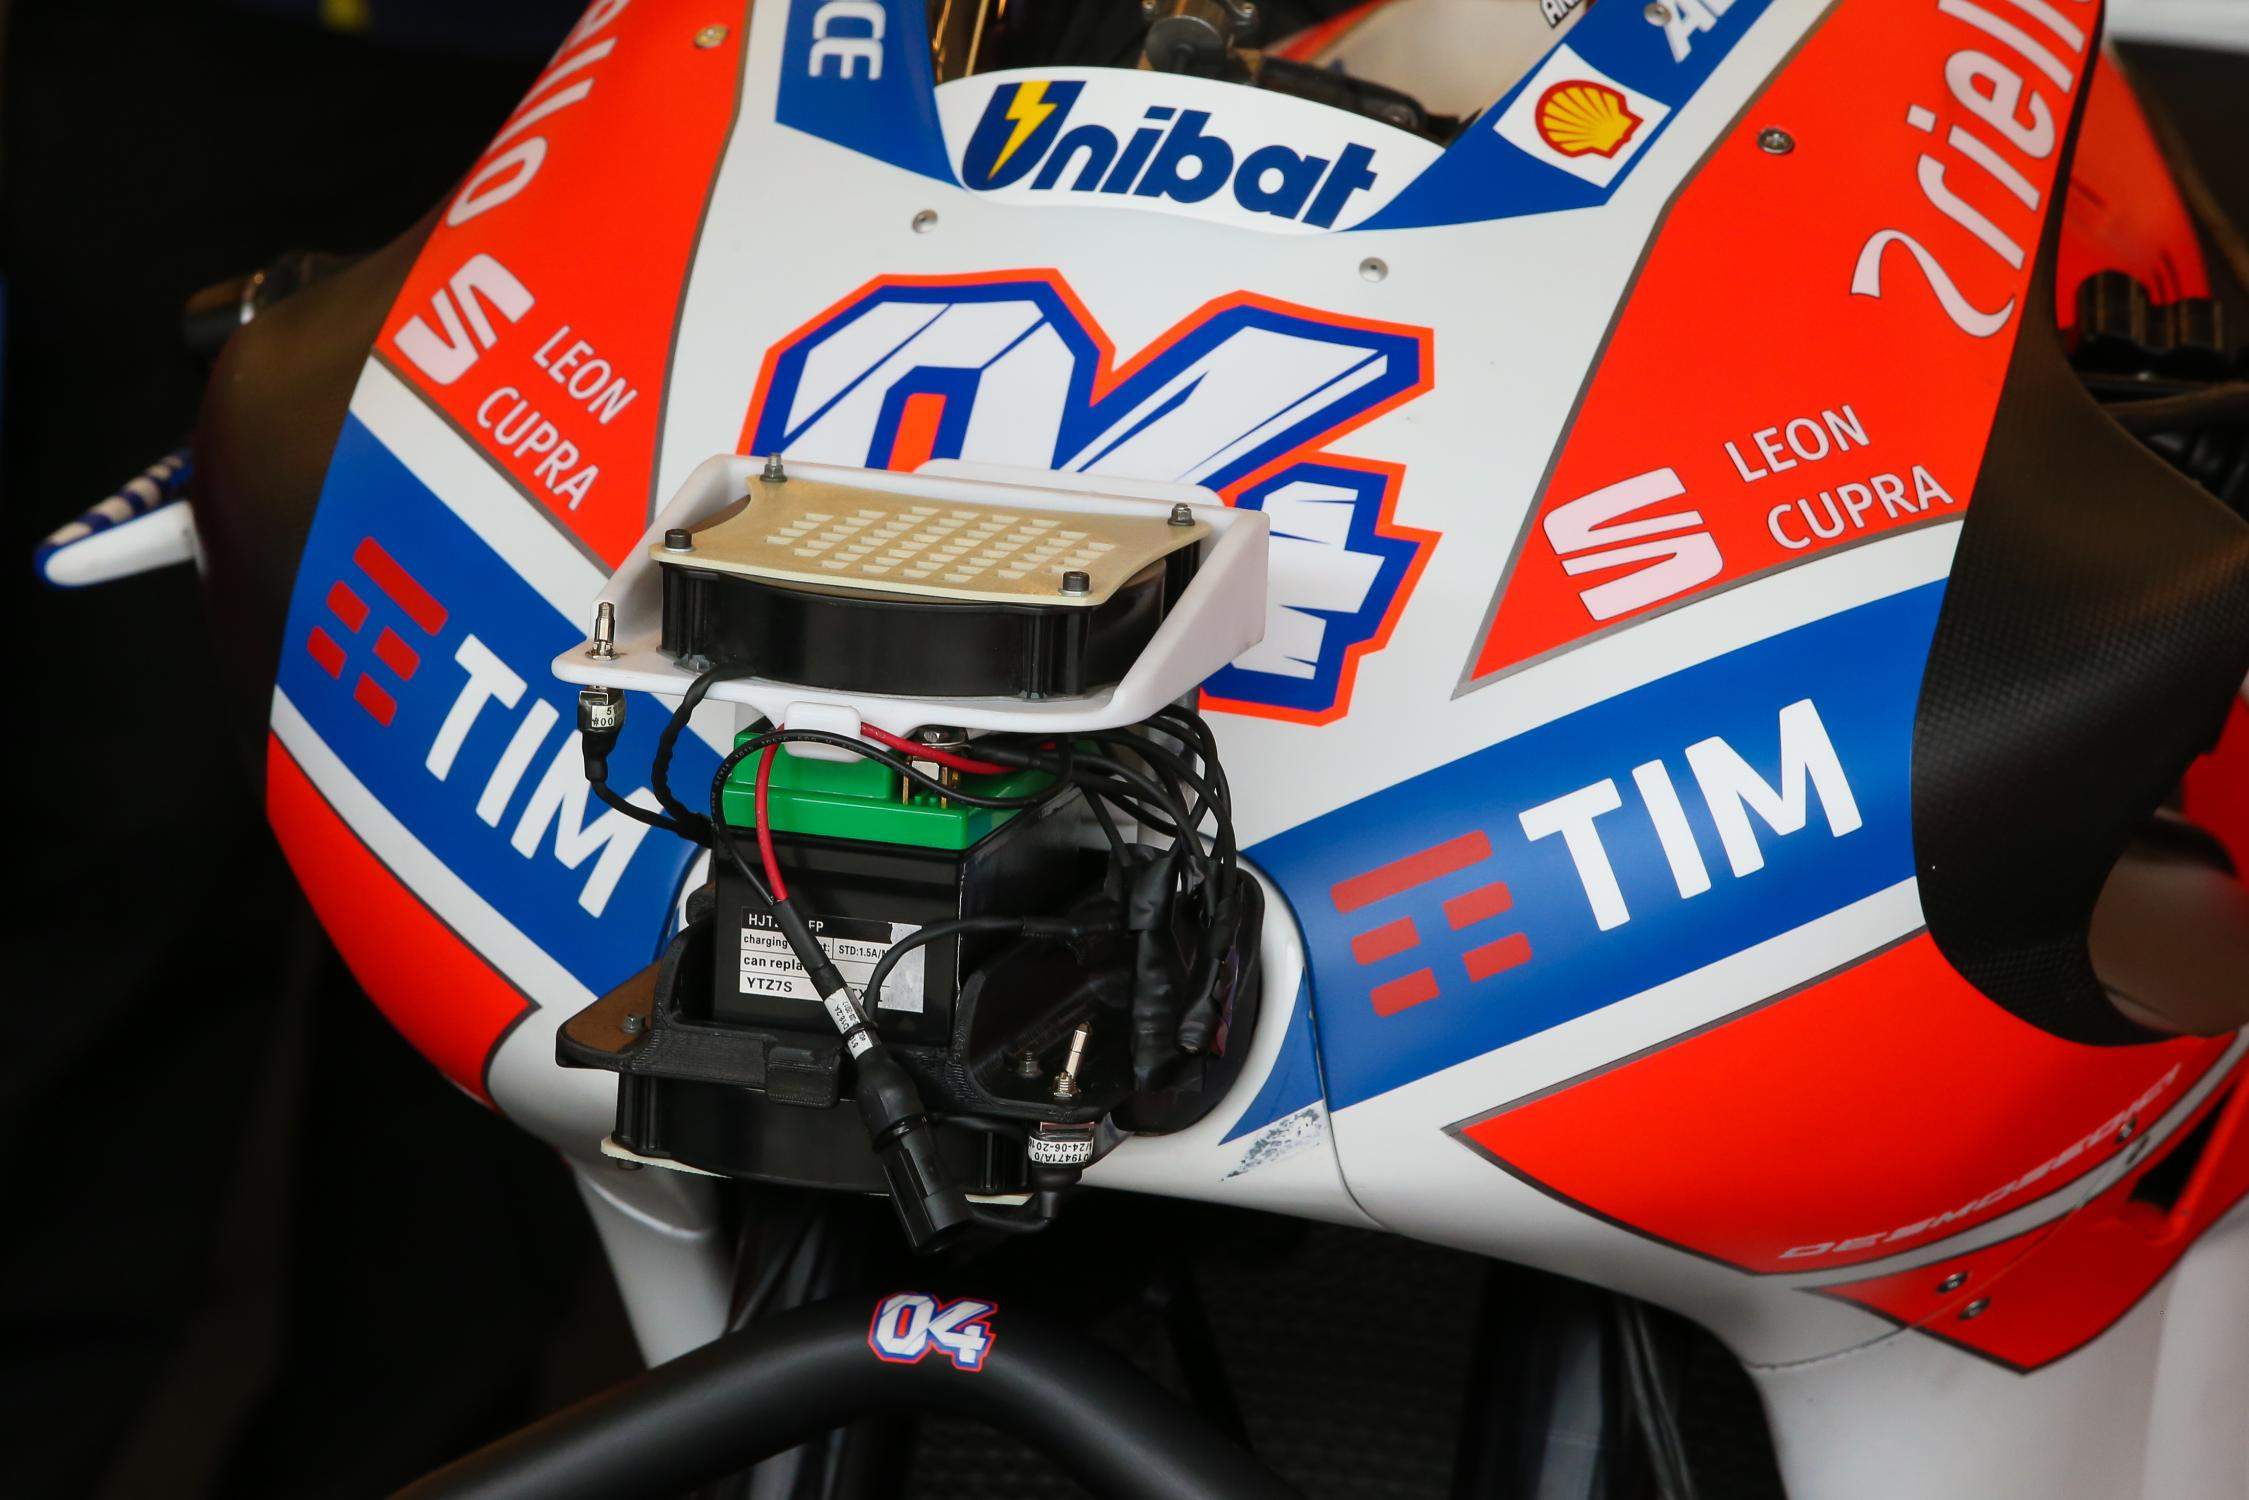 [MotoGP] Austin 04-andrea-dovizioso-itabl2_0386.gallery_full_top_fullscreen